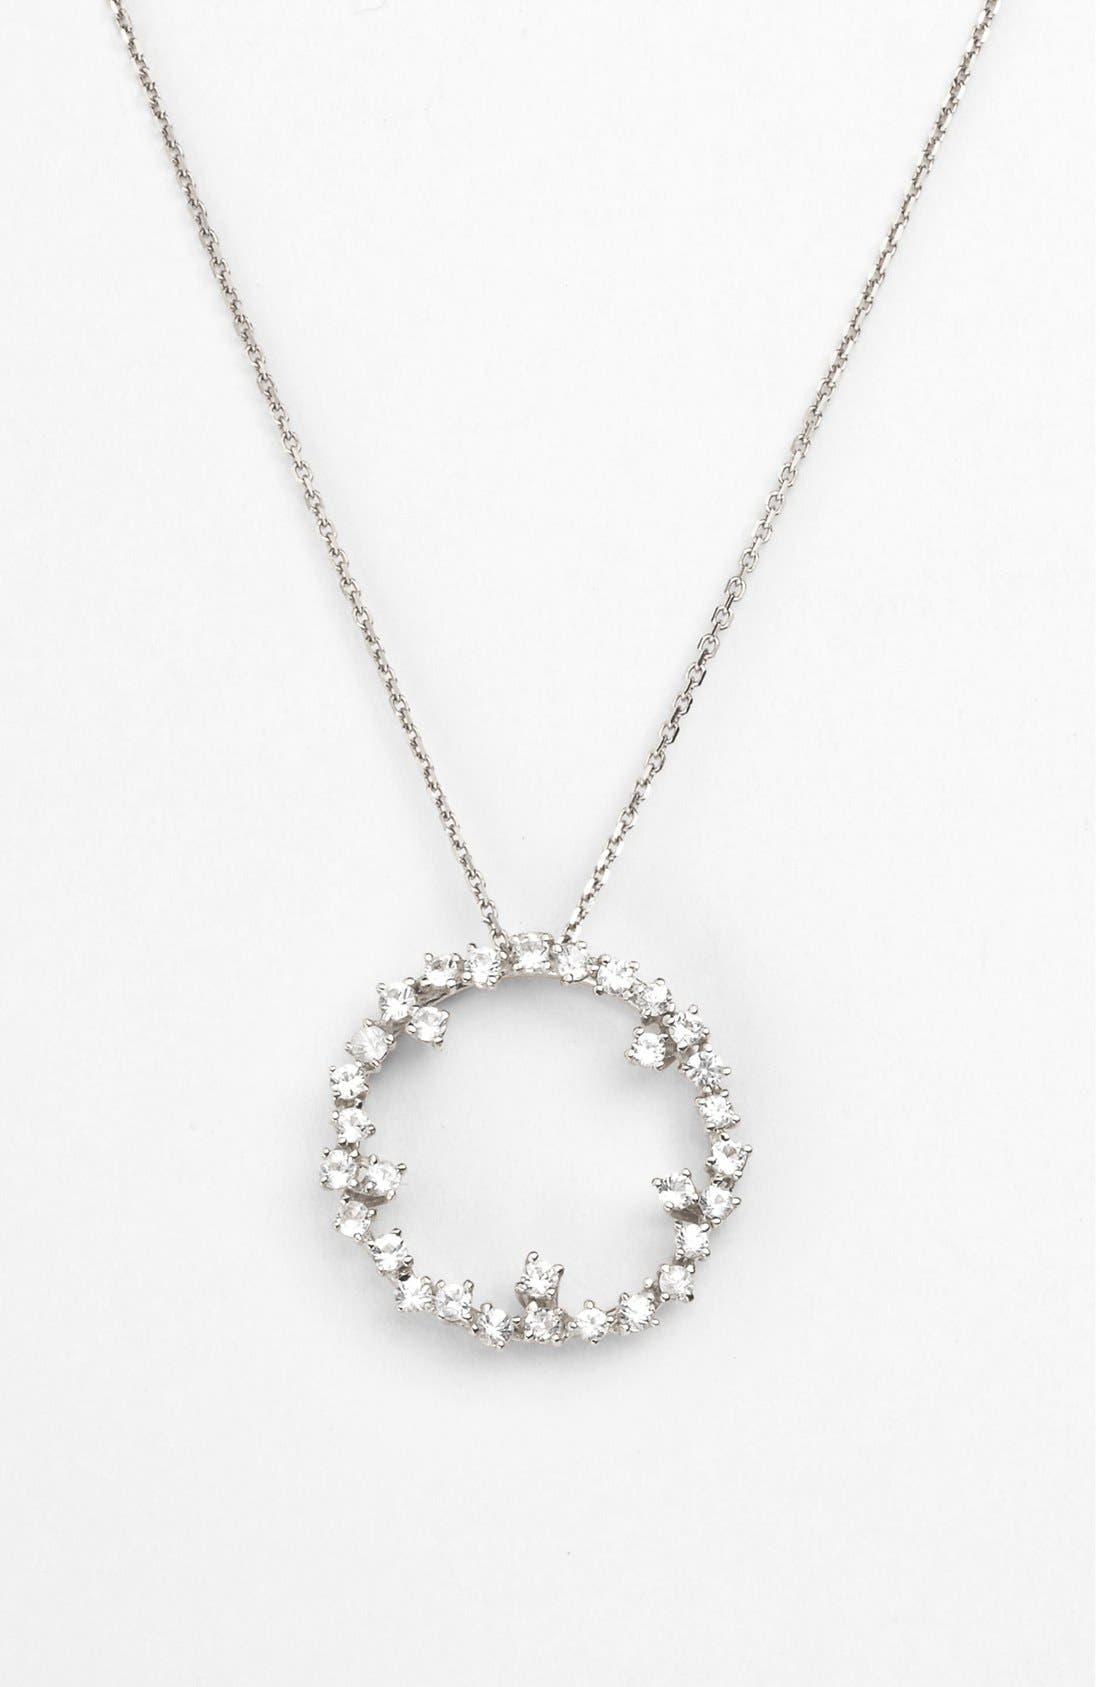 Main Image - KALAN by Suzanne Kalan 'Mini Starburst' Pendant Necklace